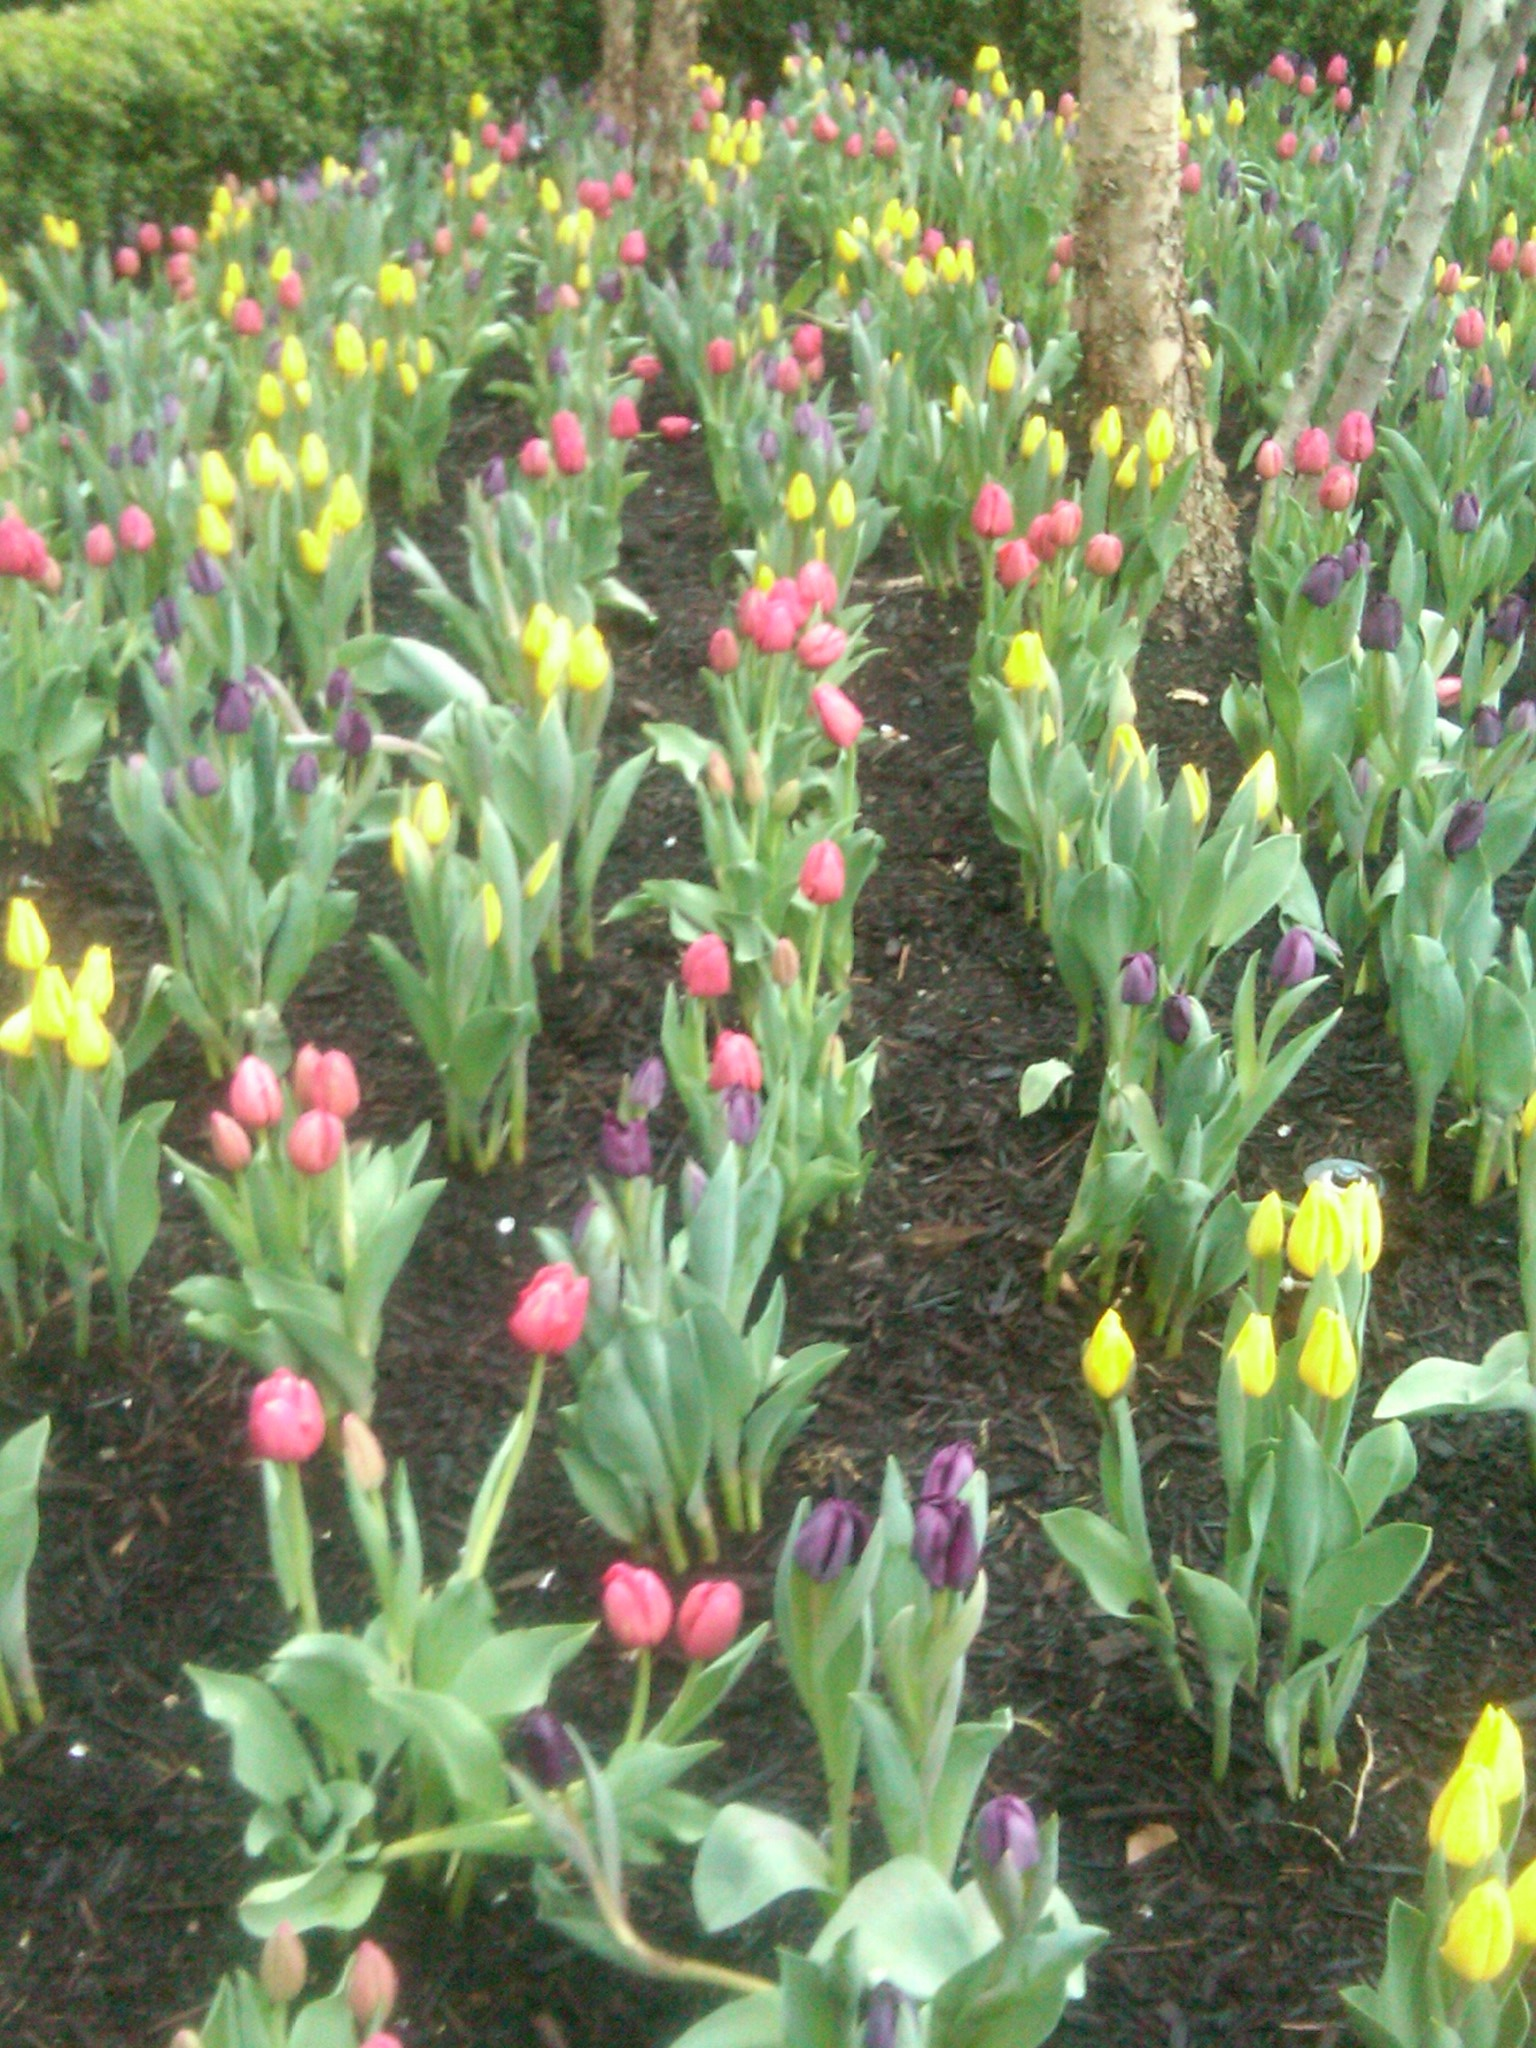 Hardest Flower To Grow Tulip Magnolias Amp Dutch Tulips The Smarter Gardener